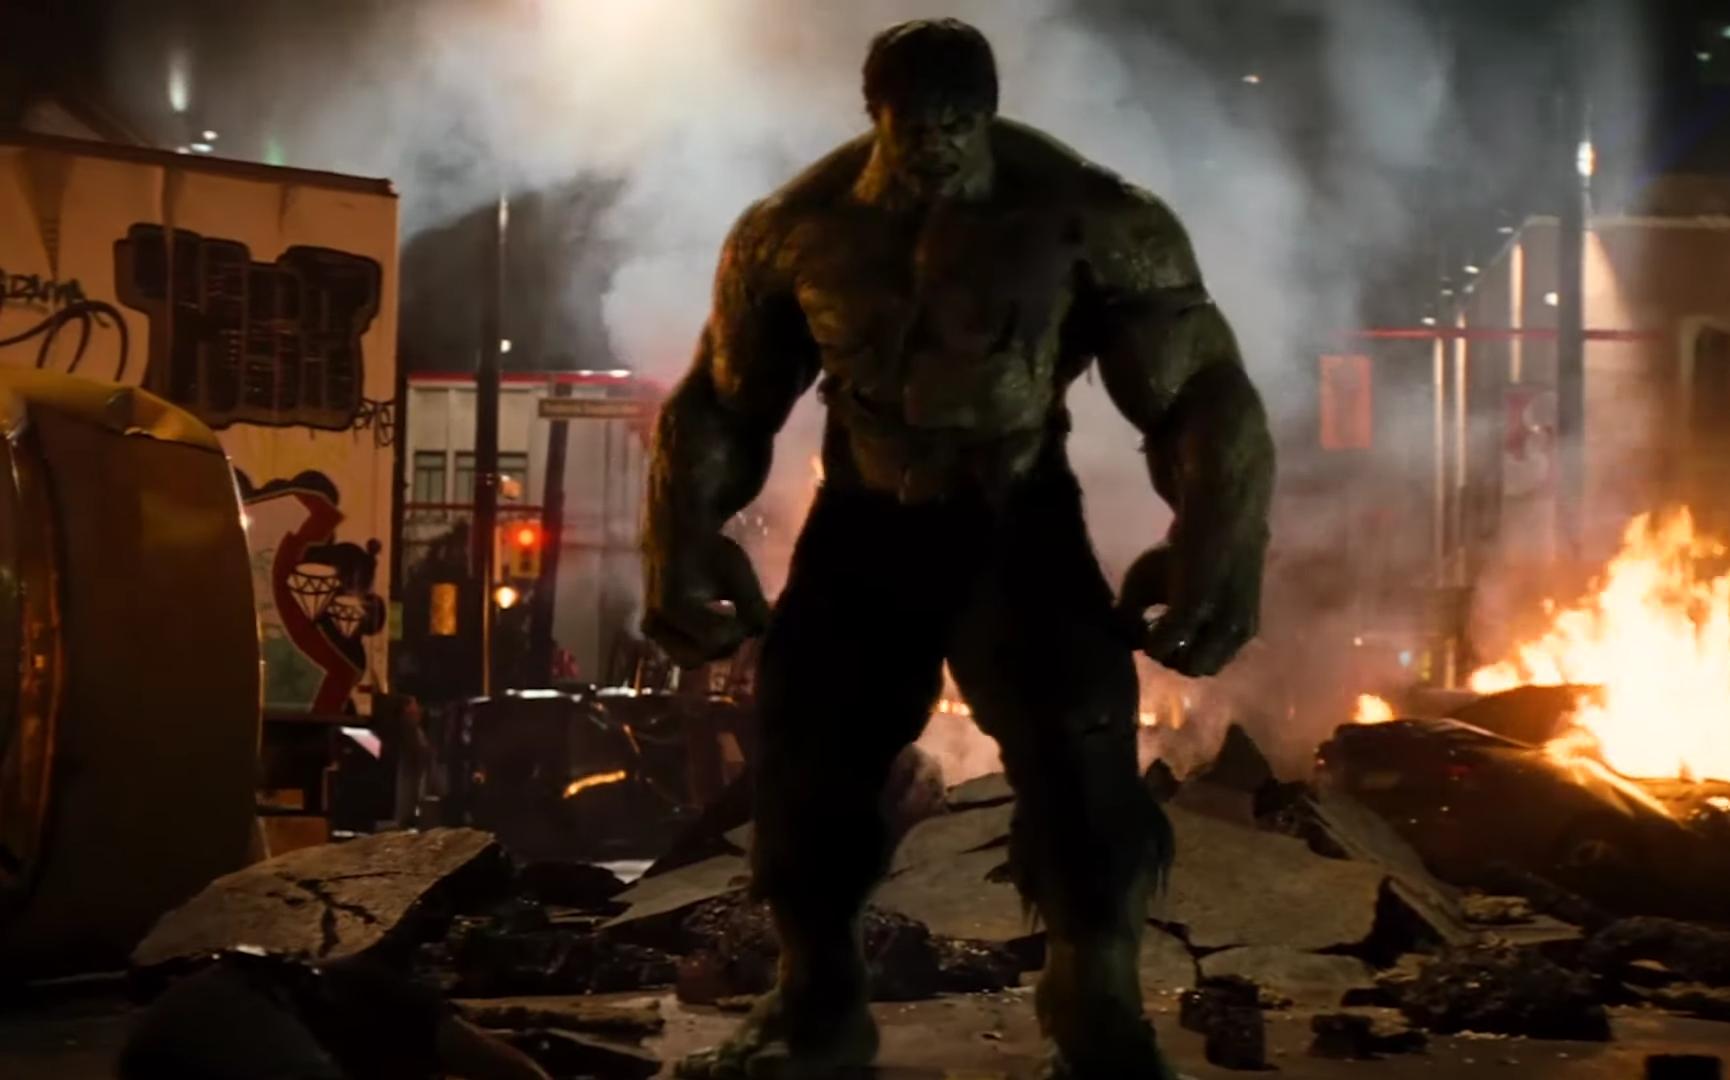 Image Credit: MCU/Avengers (Youtube/ScreenRant)